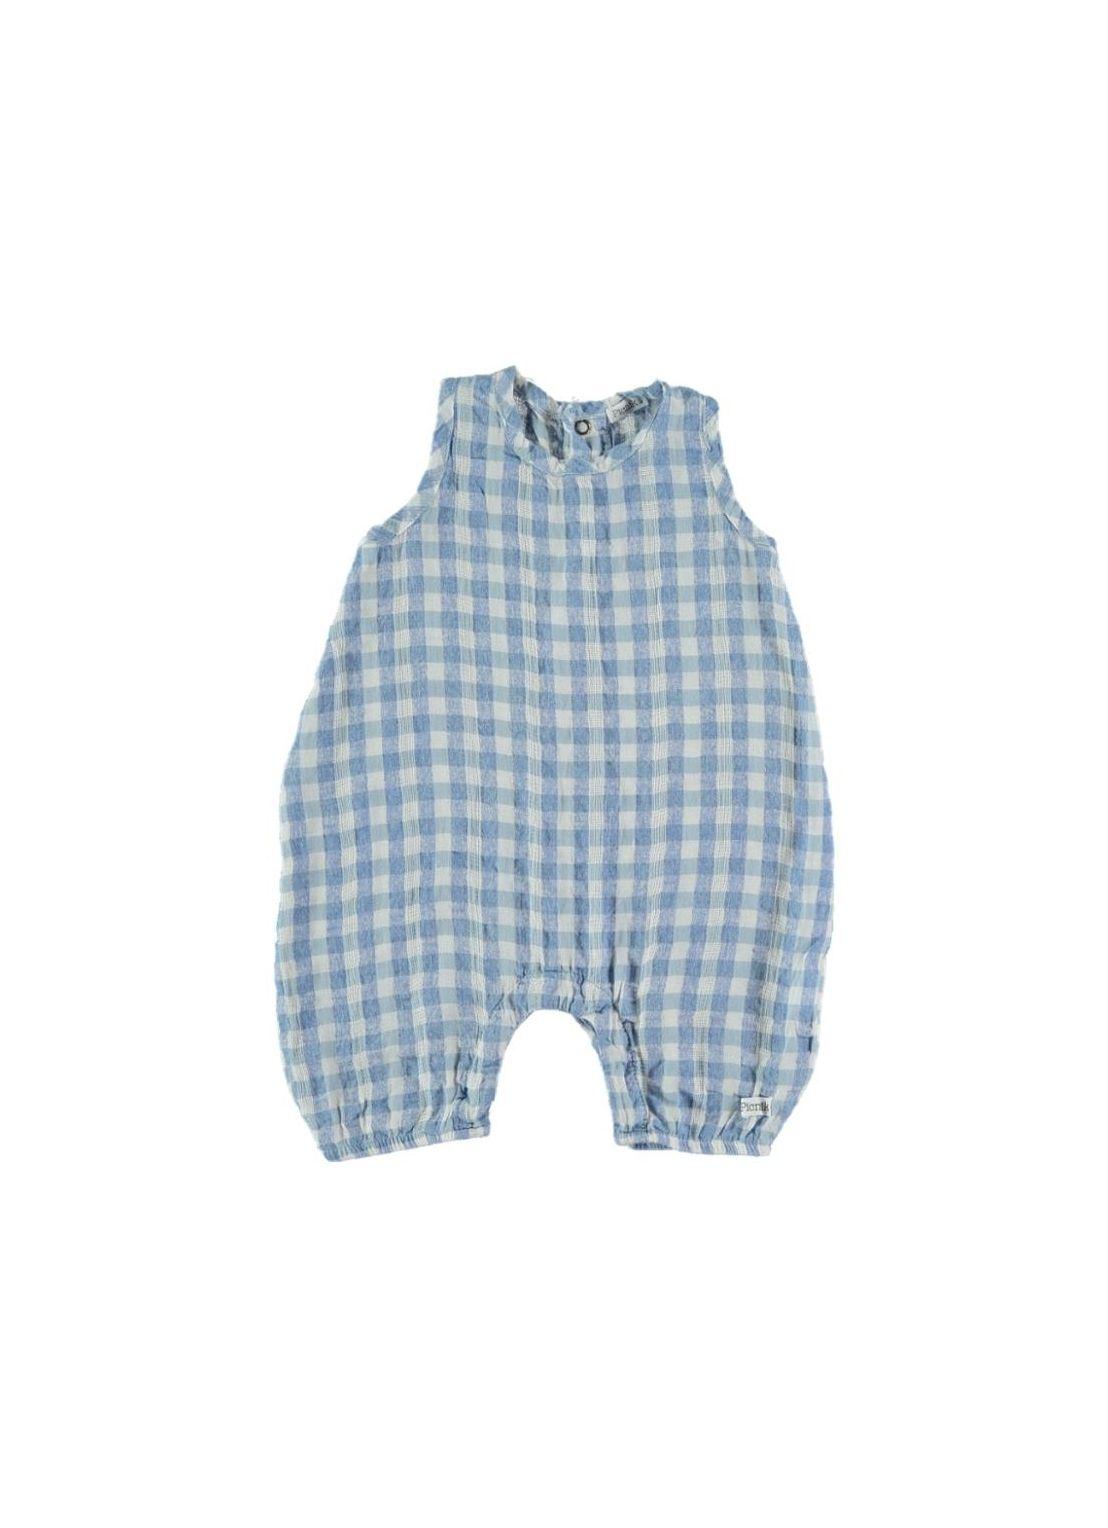 Baby ROMPER Unisex-50% Cotton 50% CV- Woven